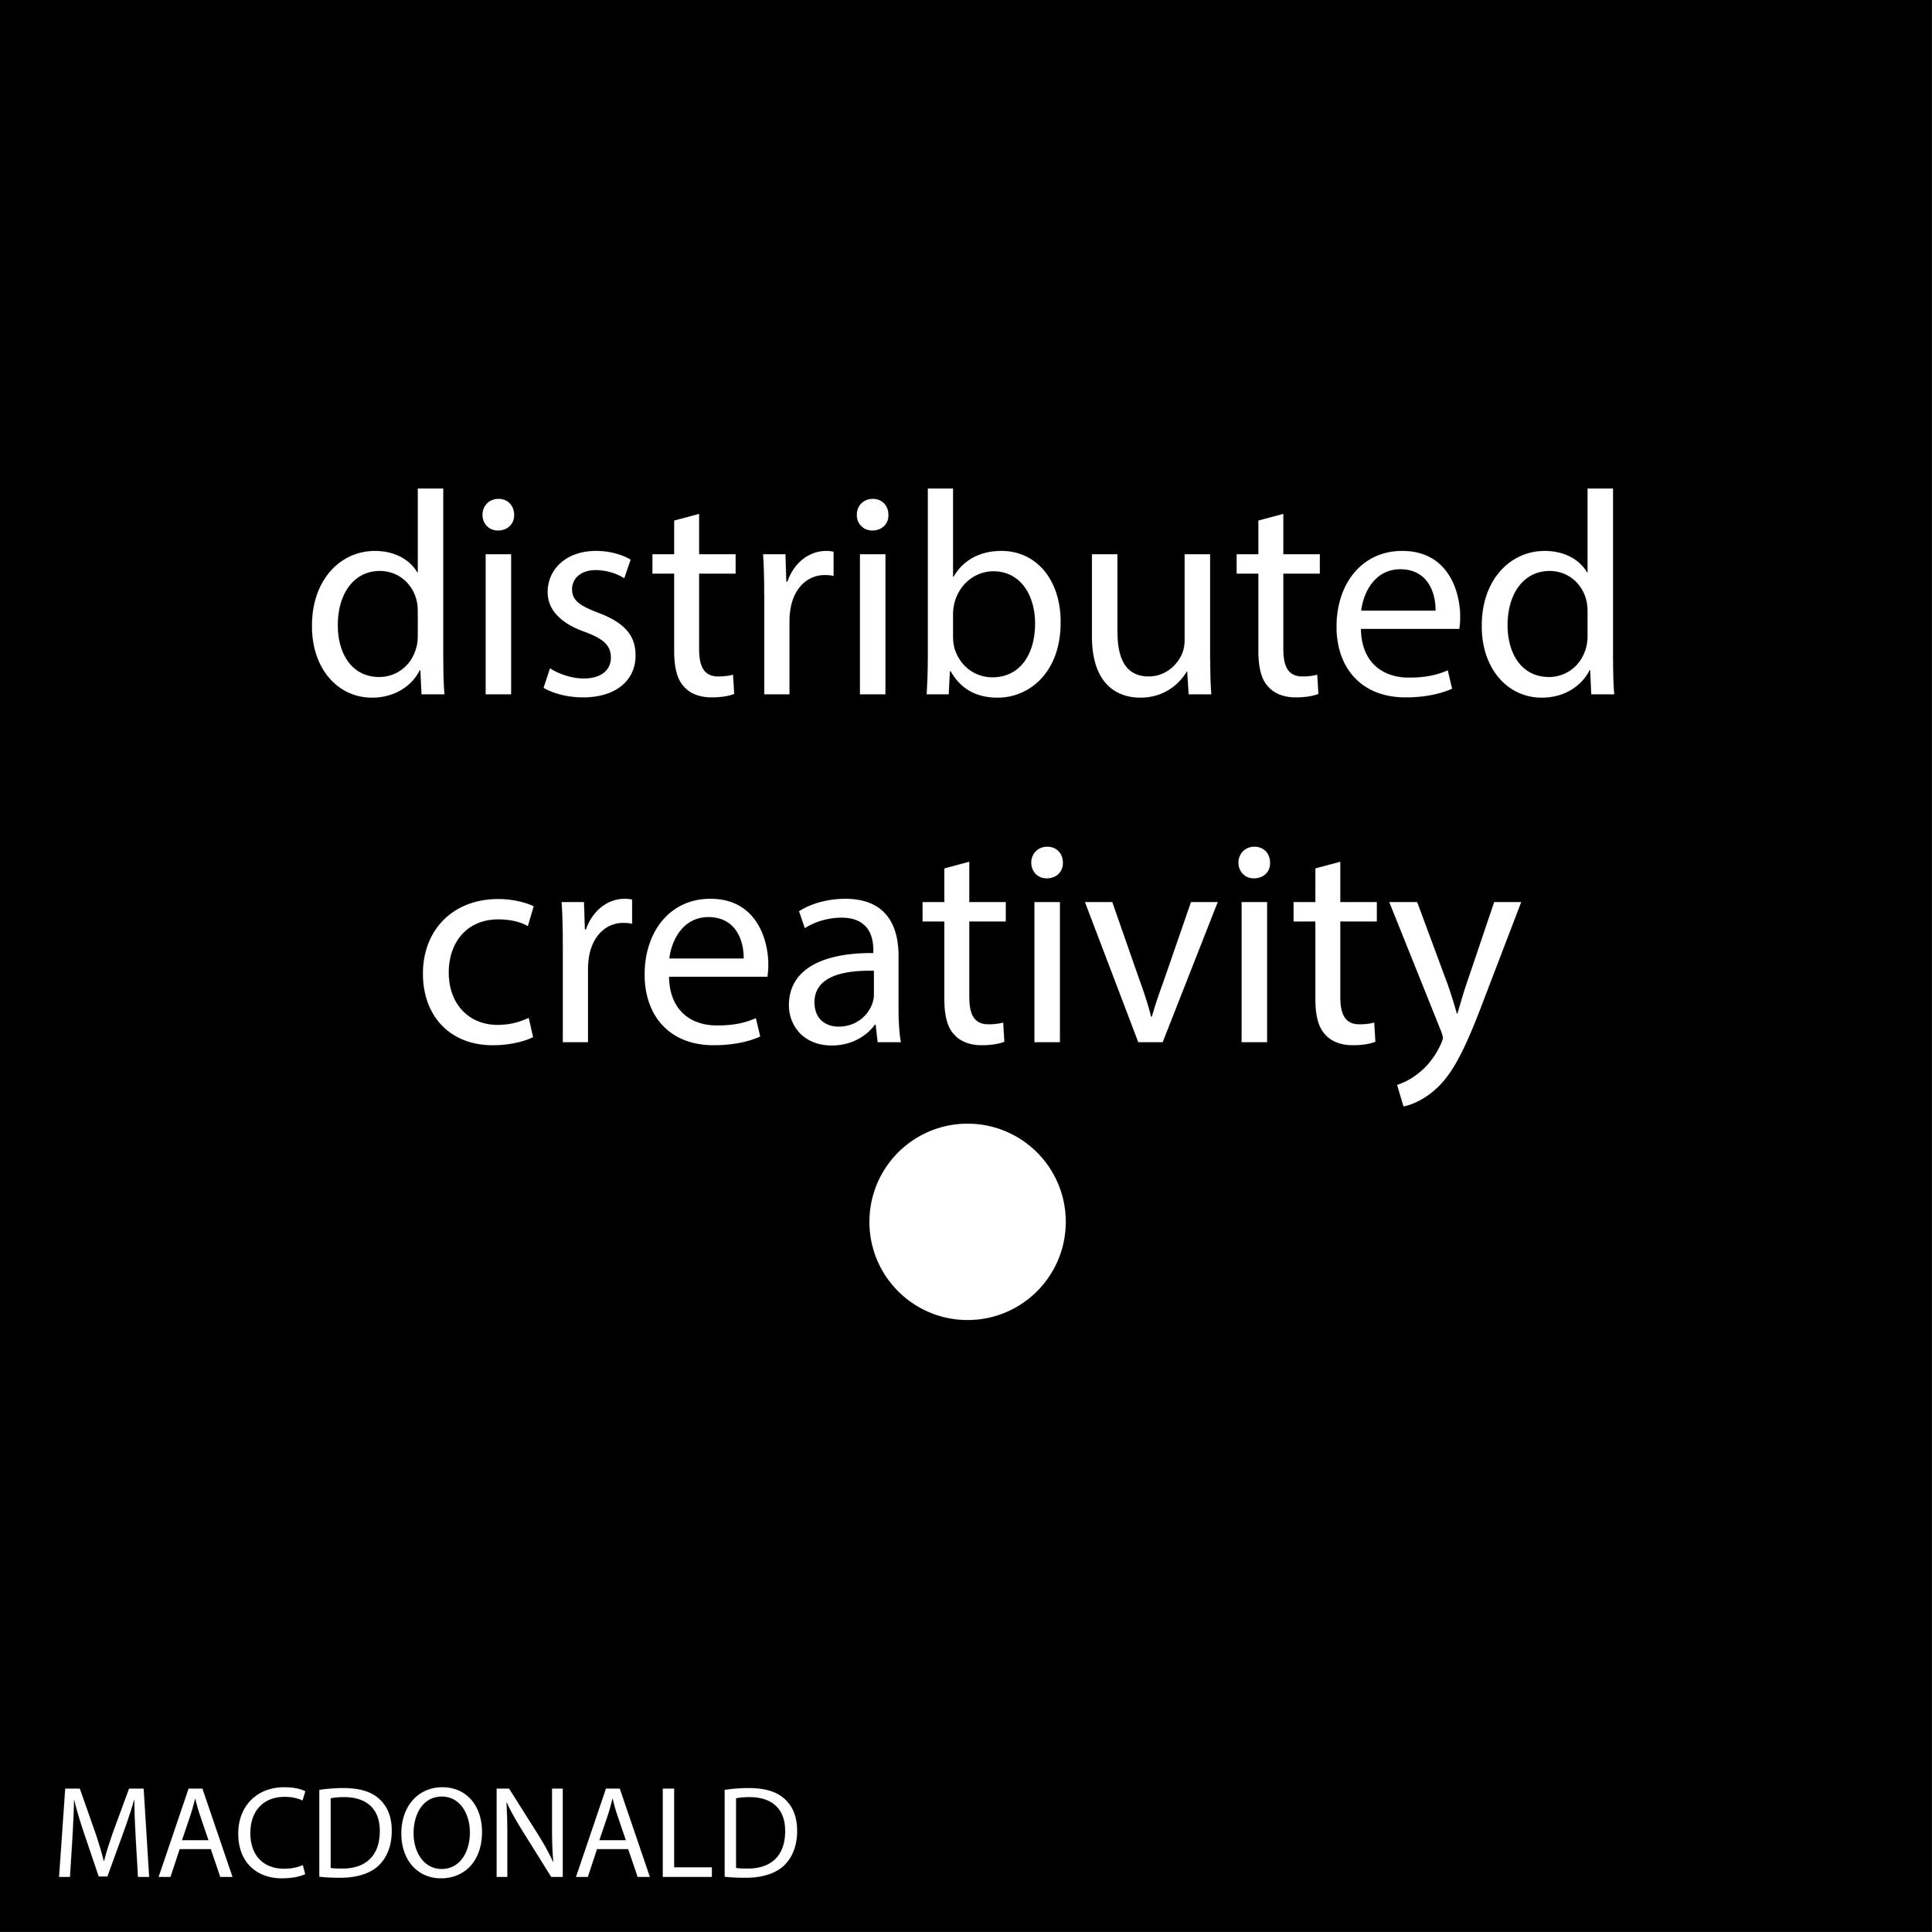 distributed_creativity.jpg